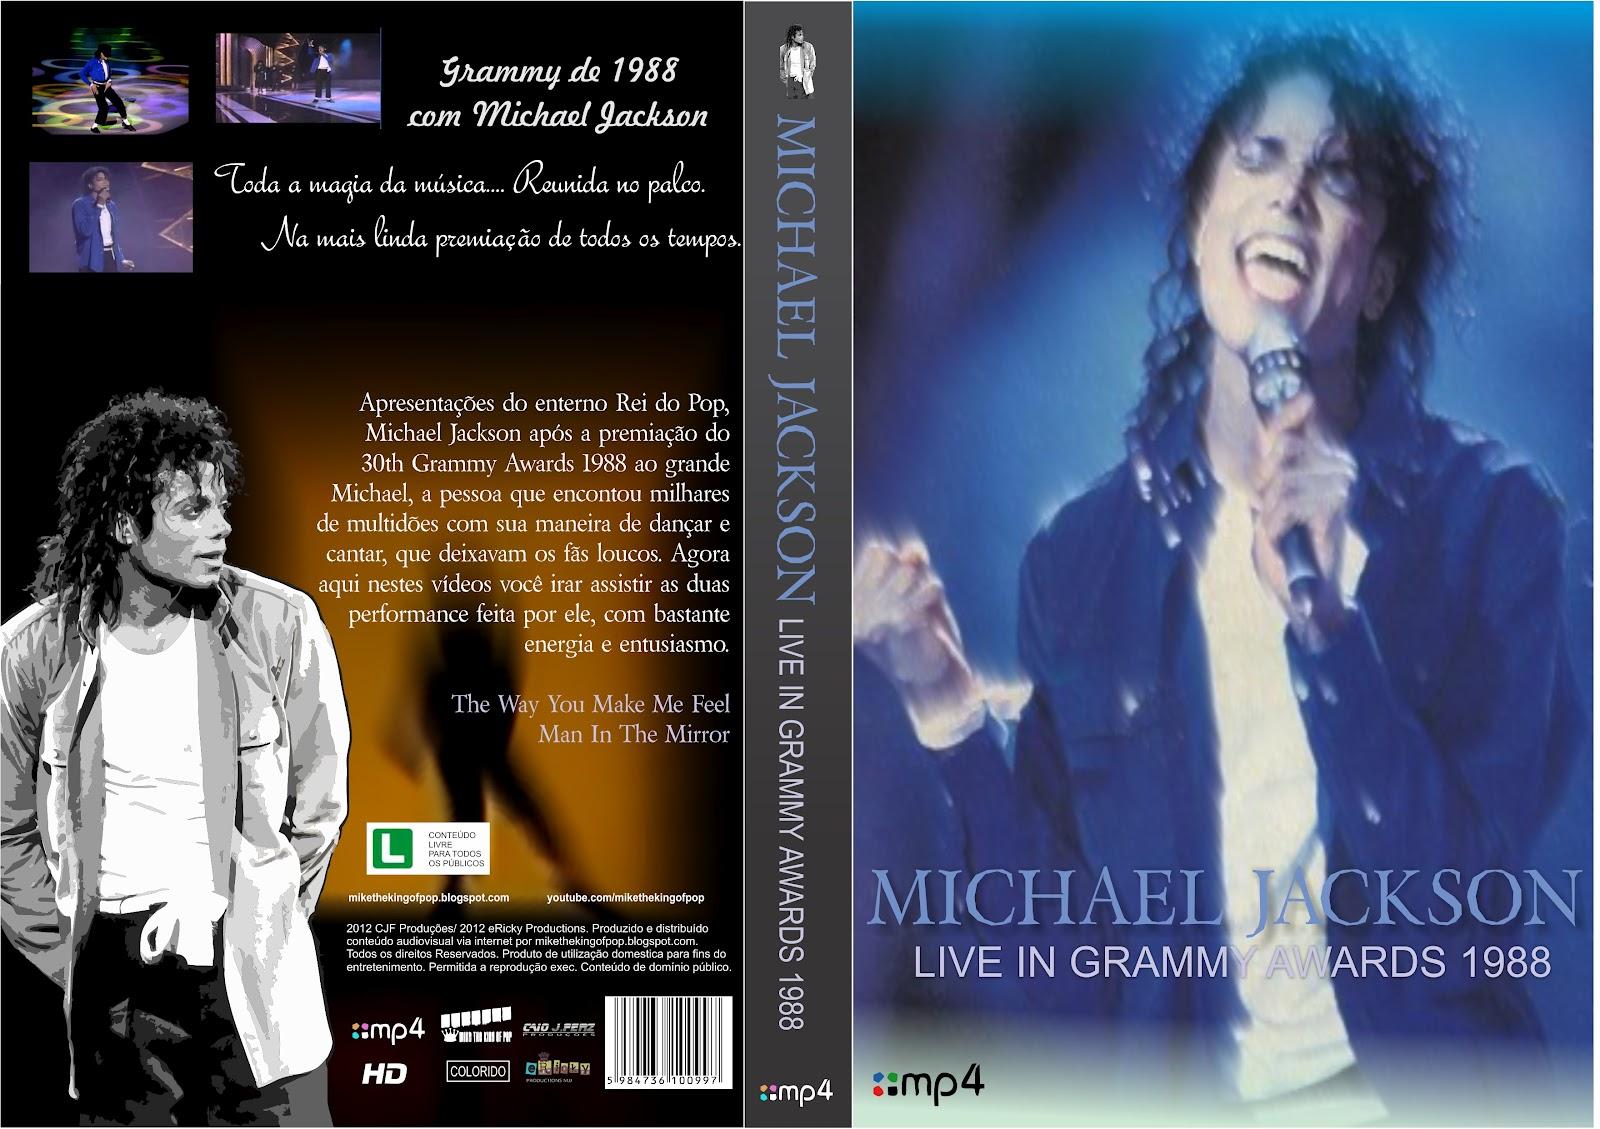 http://2.bp.blogspot.com/-LE494b7IZDQ/T4SwVFSM4DI/AAAAAAAAADk/pPWge5AigBo/s1600/Capa+-+Michael+Jackson+Live+In+Grammy+Awards+1988+HD.jpg